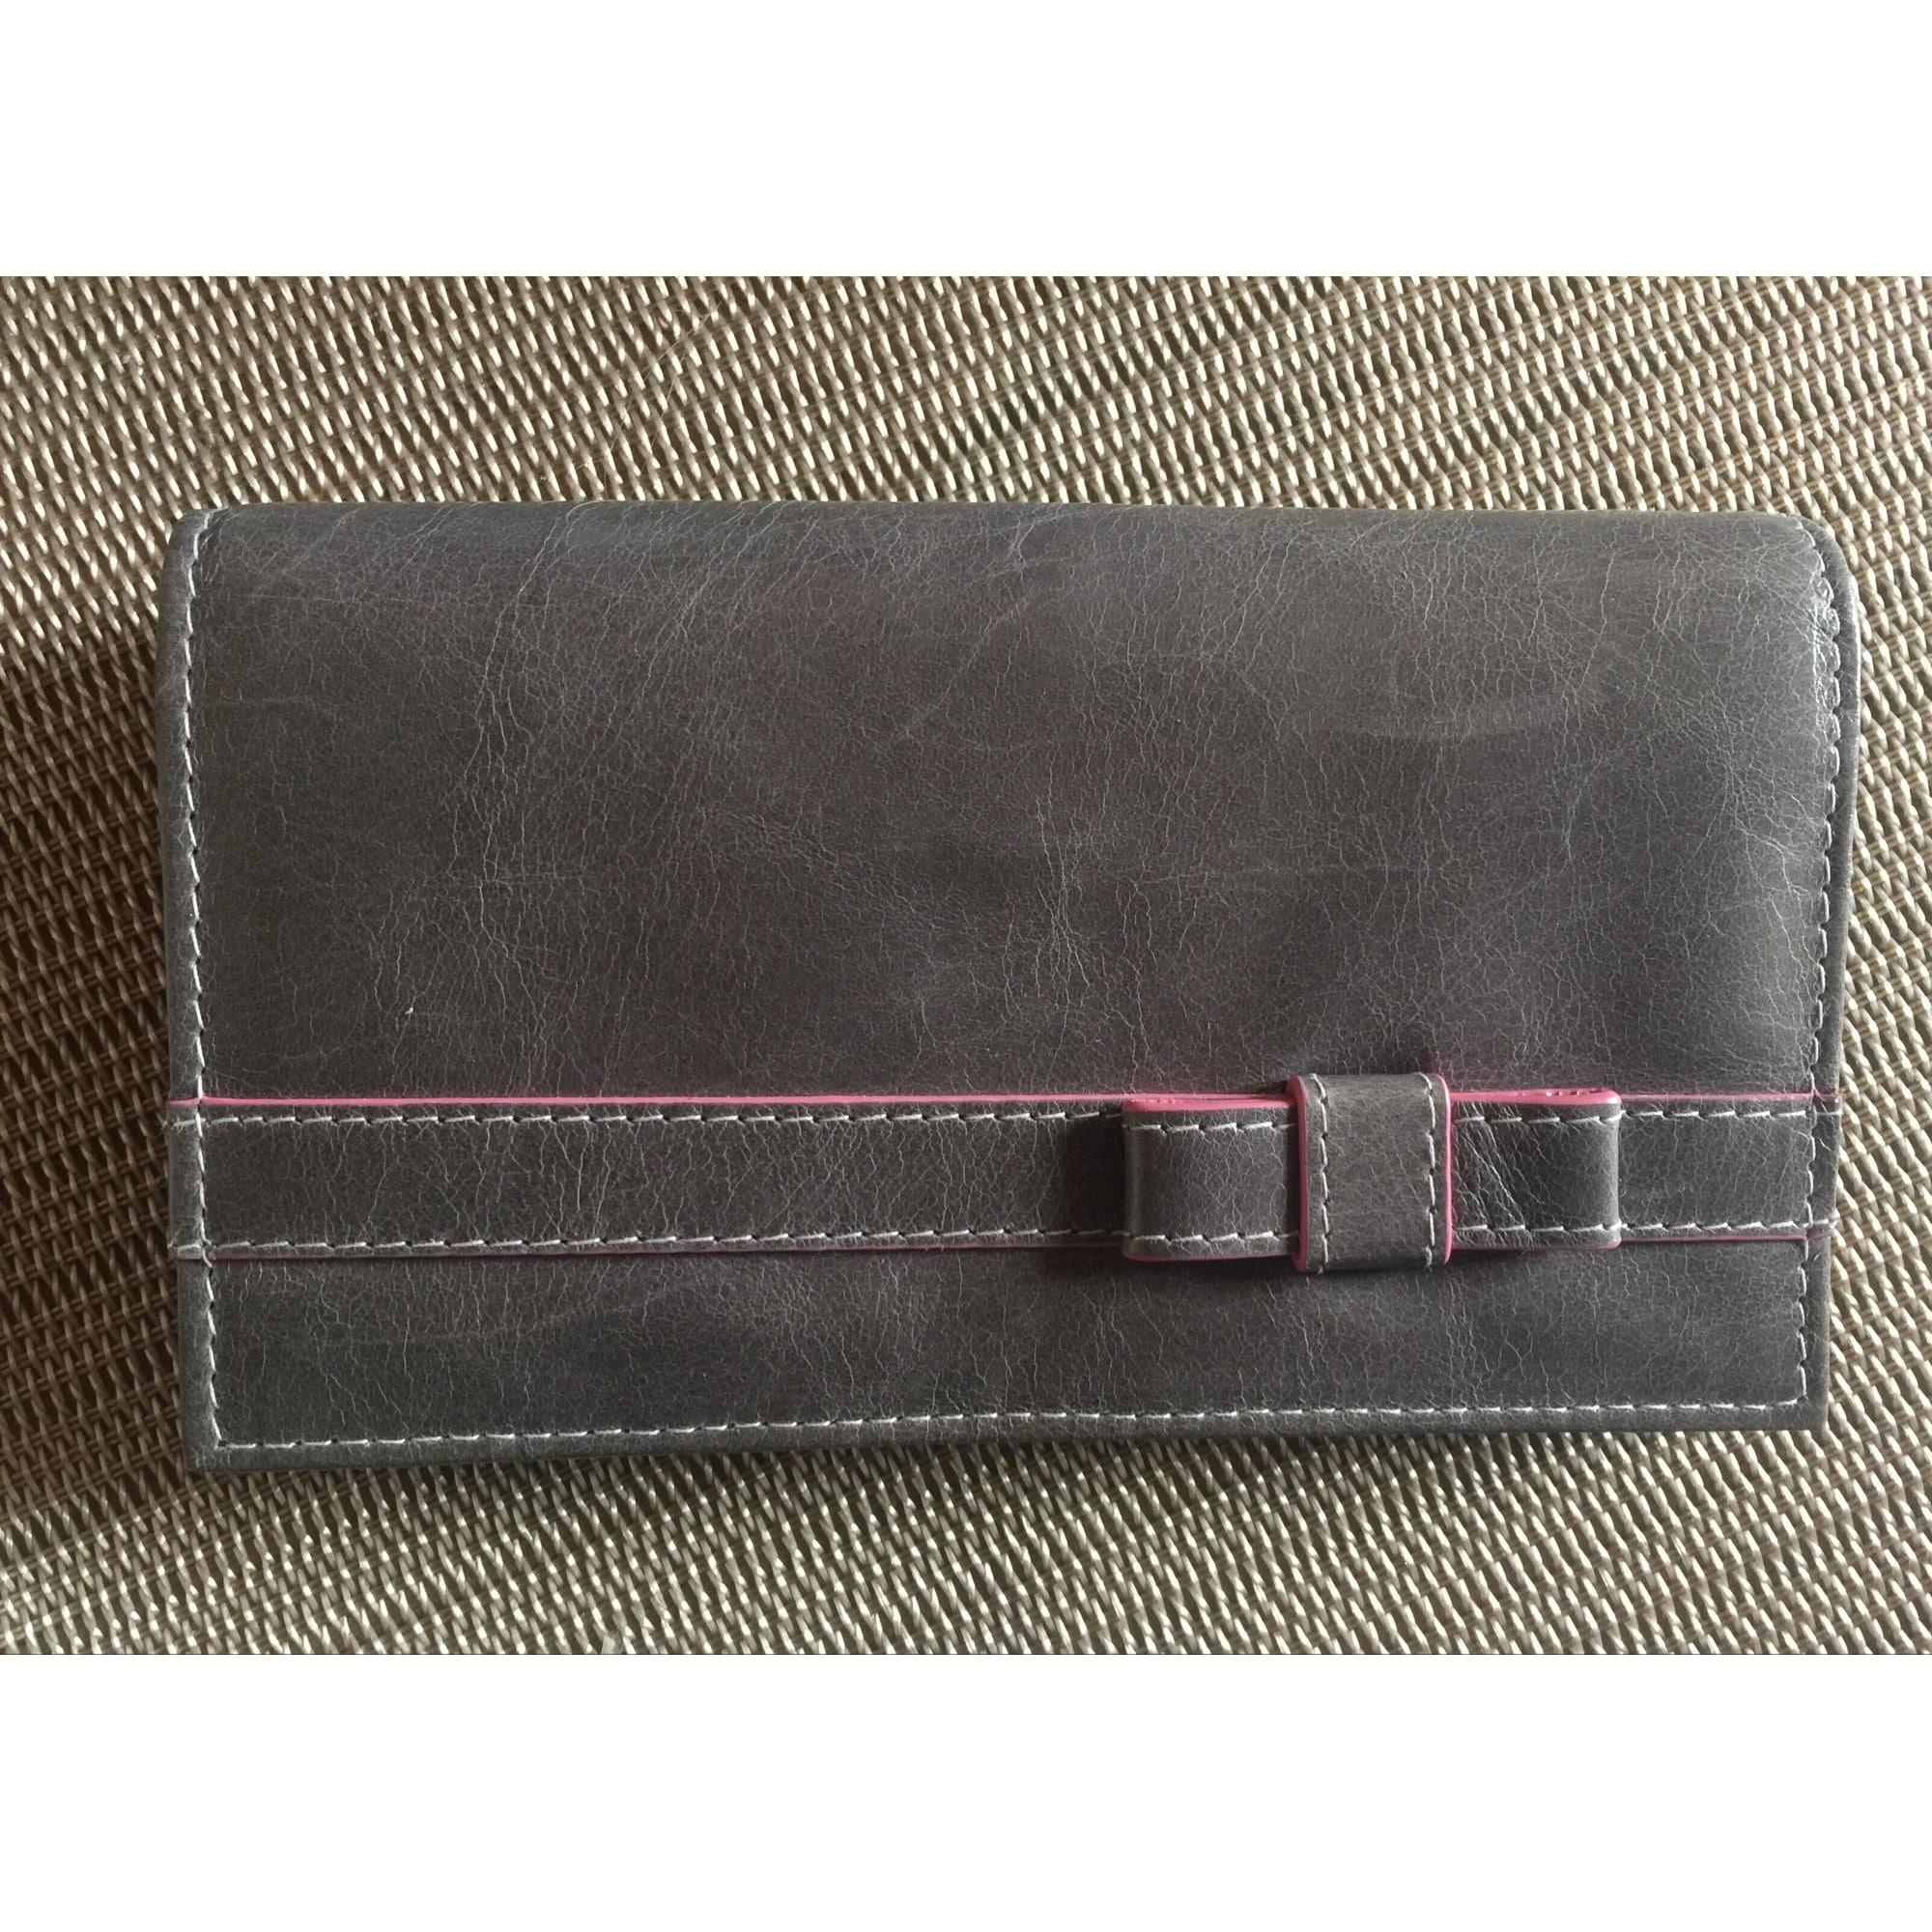 Portefeuille BRONTIBAY gris vendu par Sandrine490571 - 7751090 d364b5ffdfc